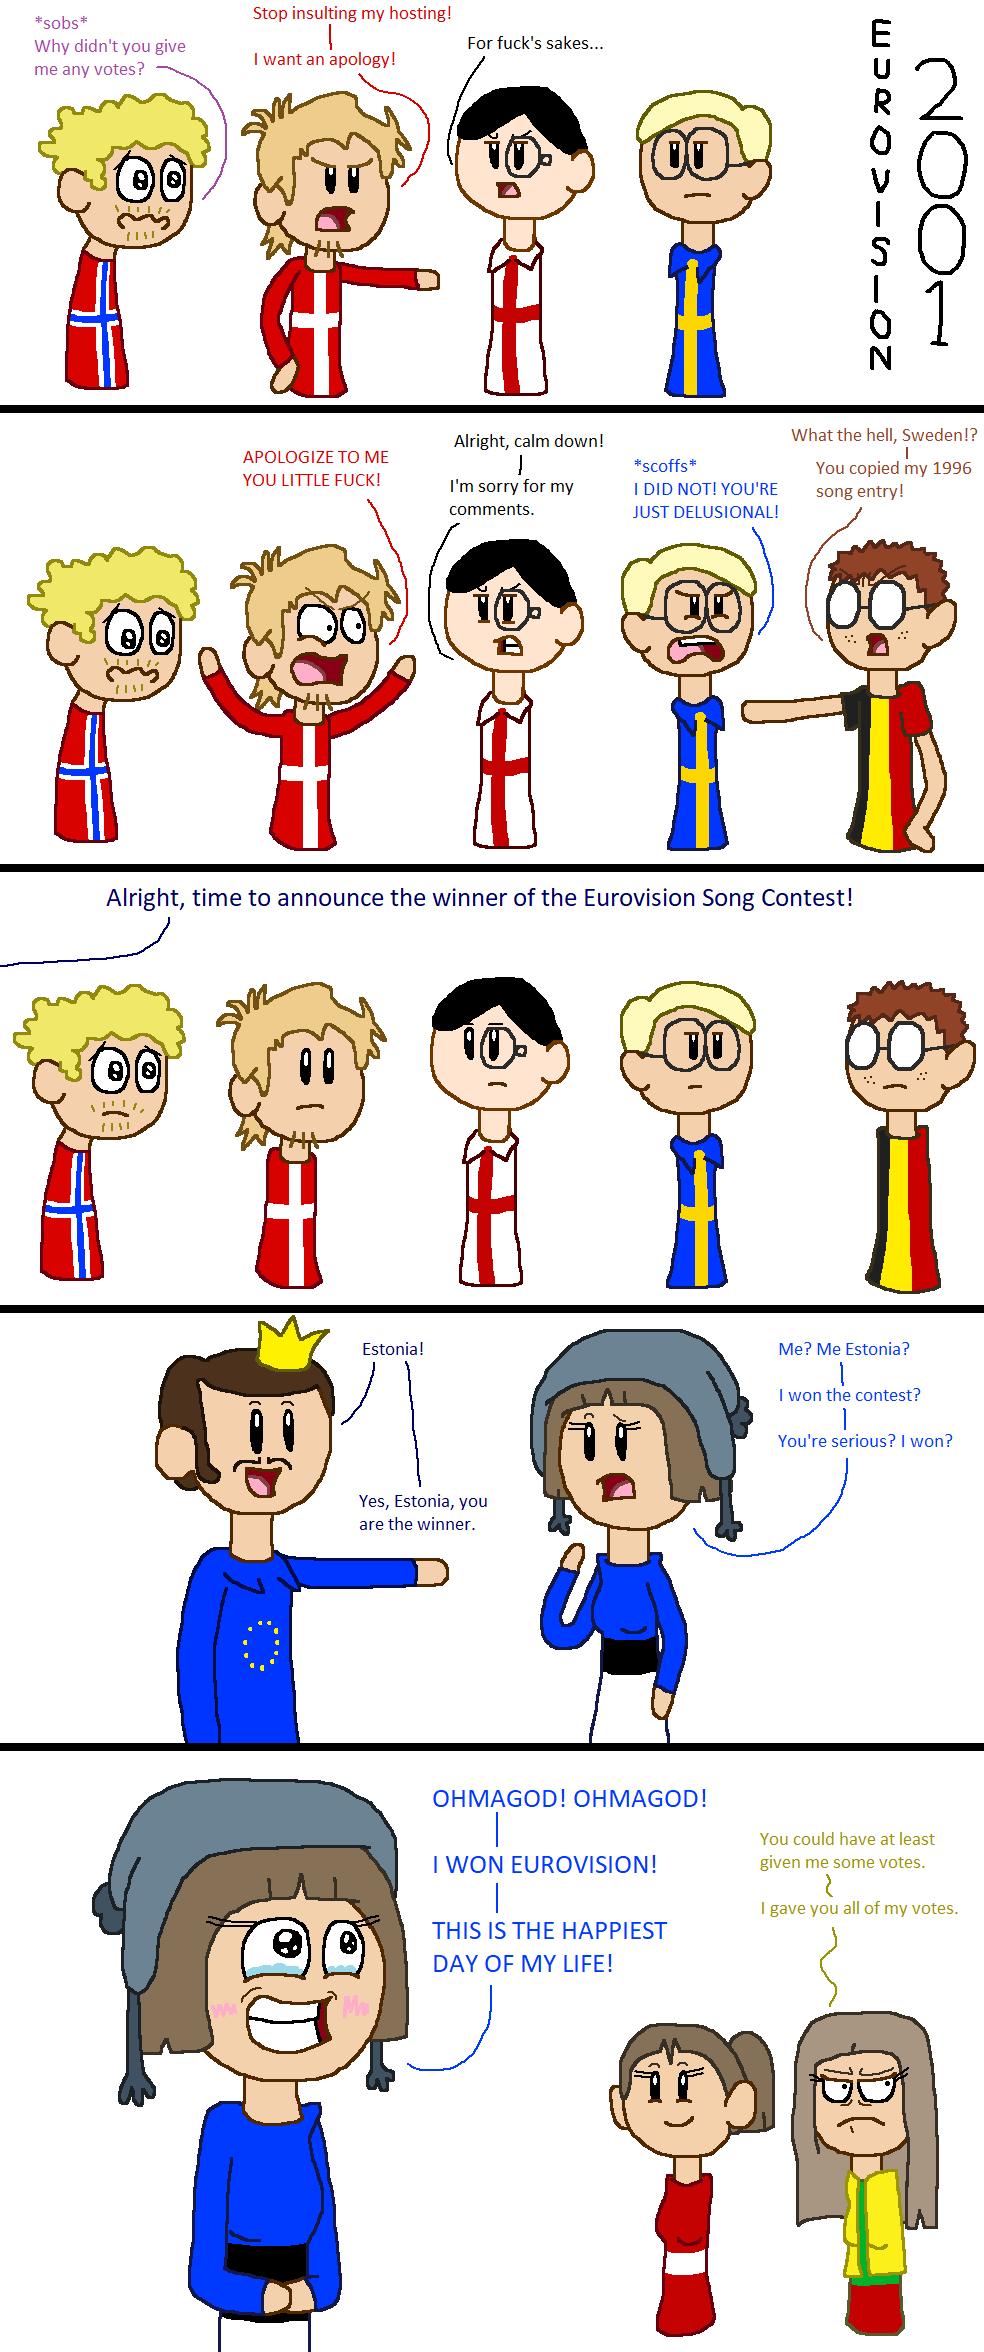 Eurovision 2001 satwcomic.com